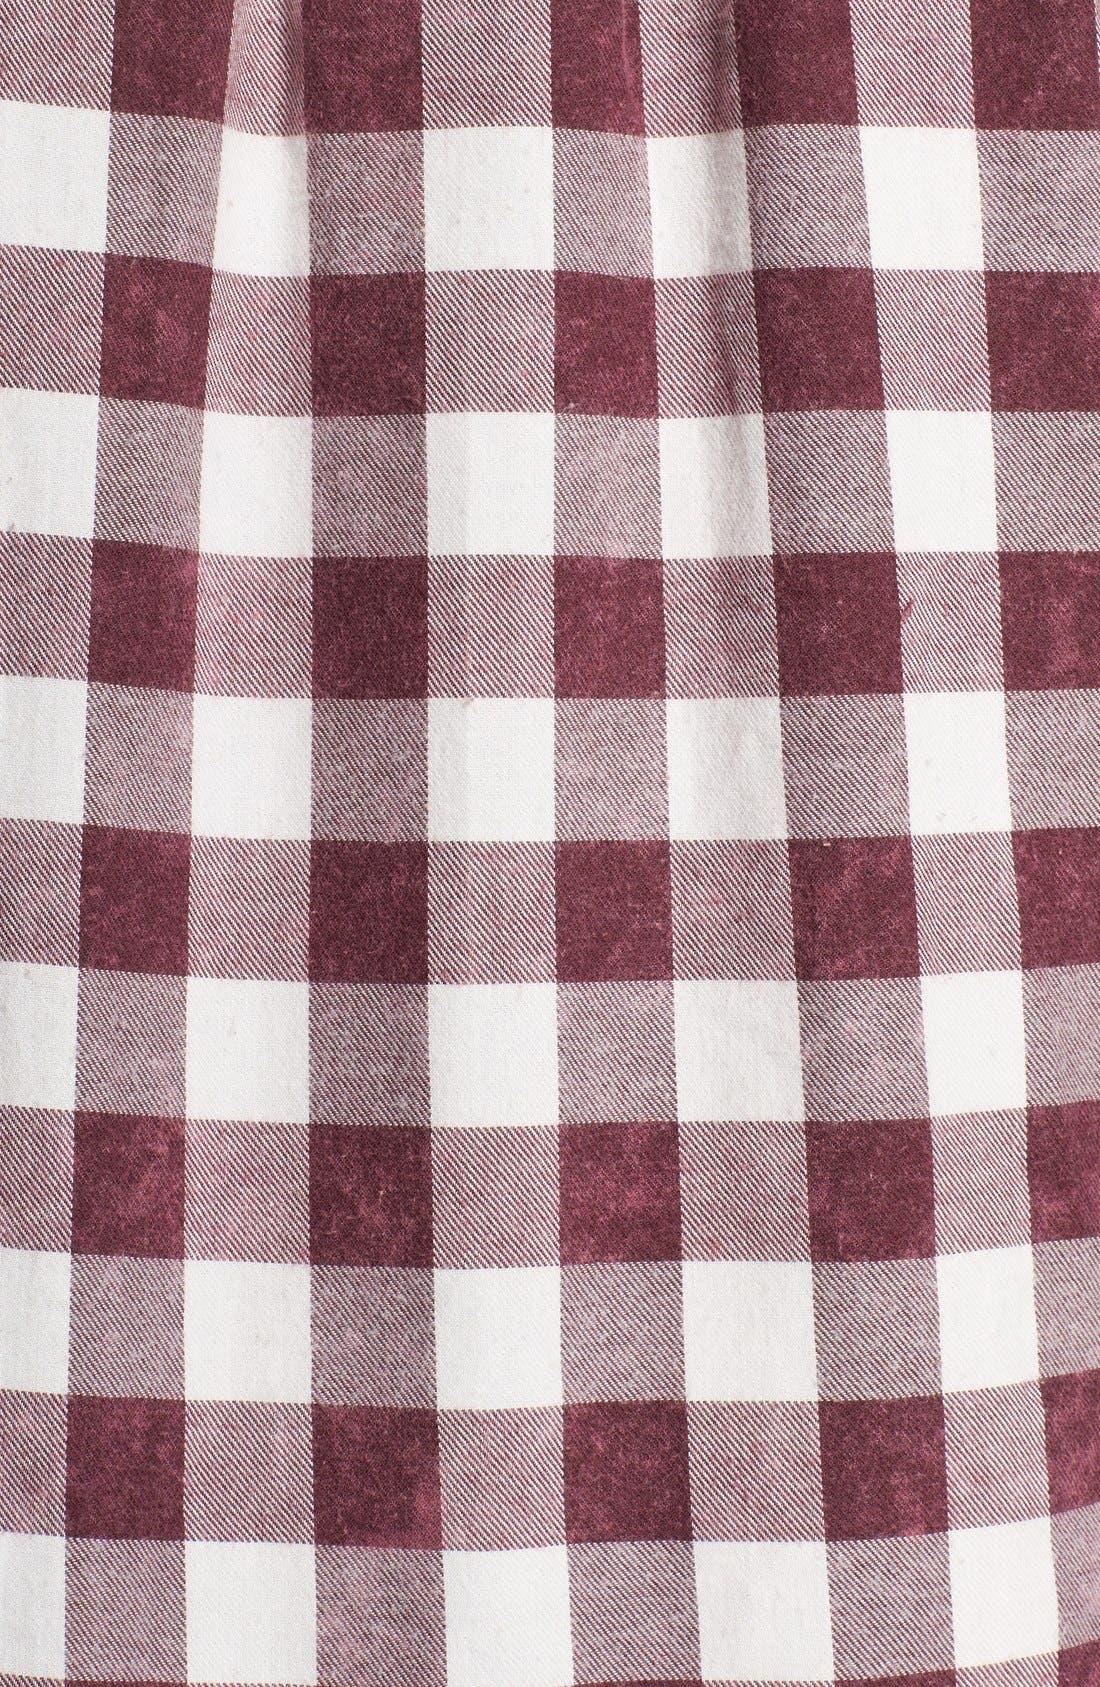 Plaid Cotton Blend Nightshirt,                             Alternate thumbnail 40, color,